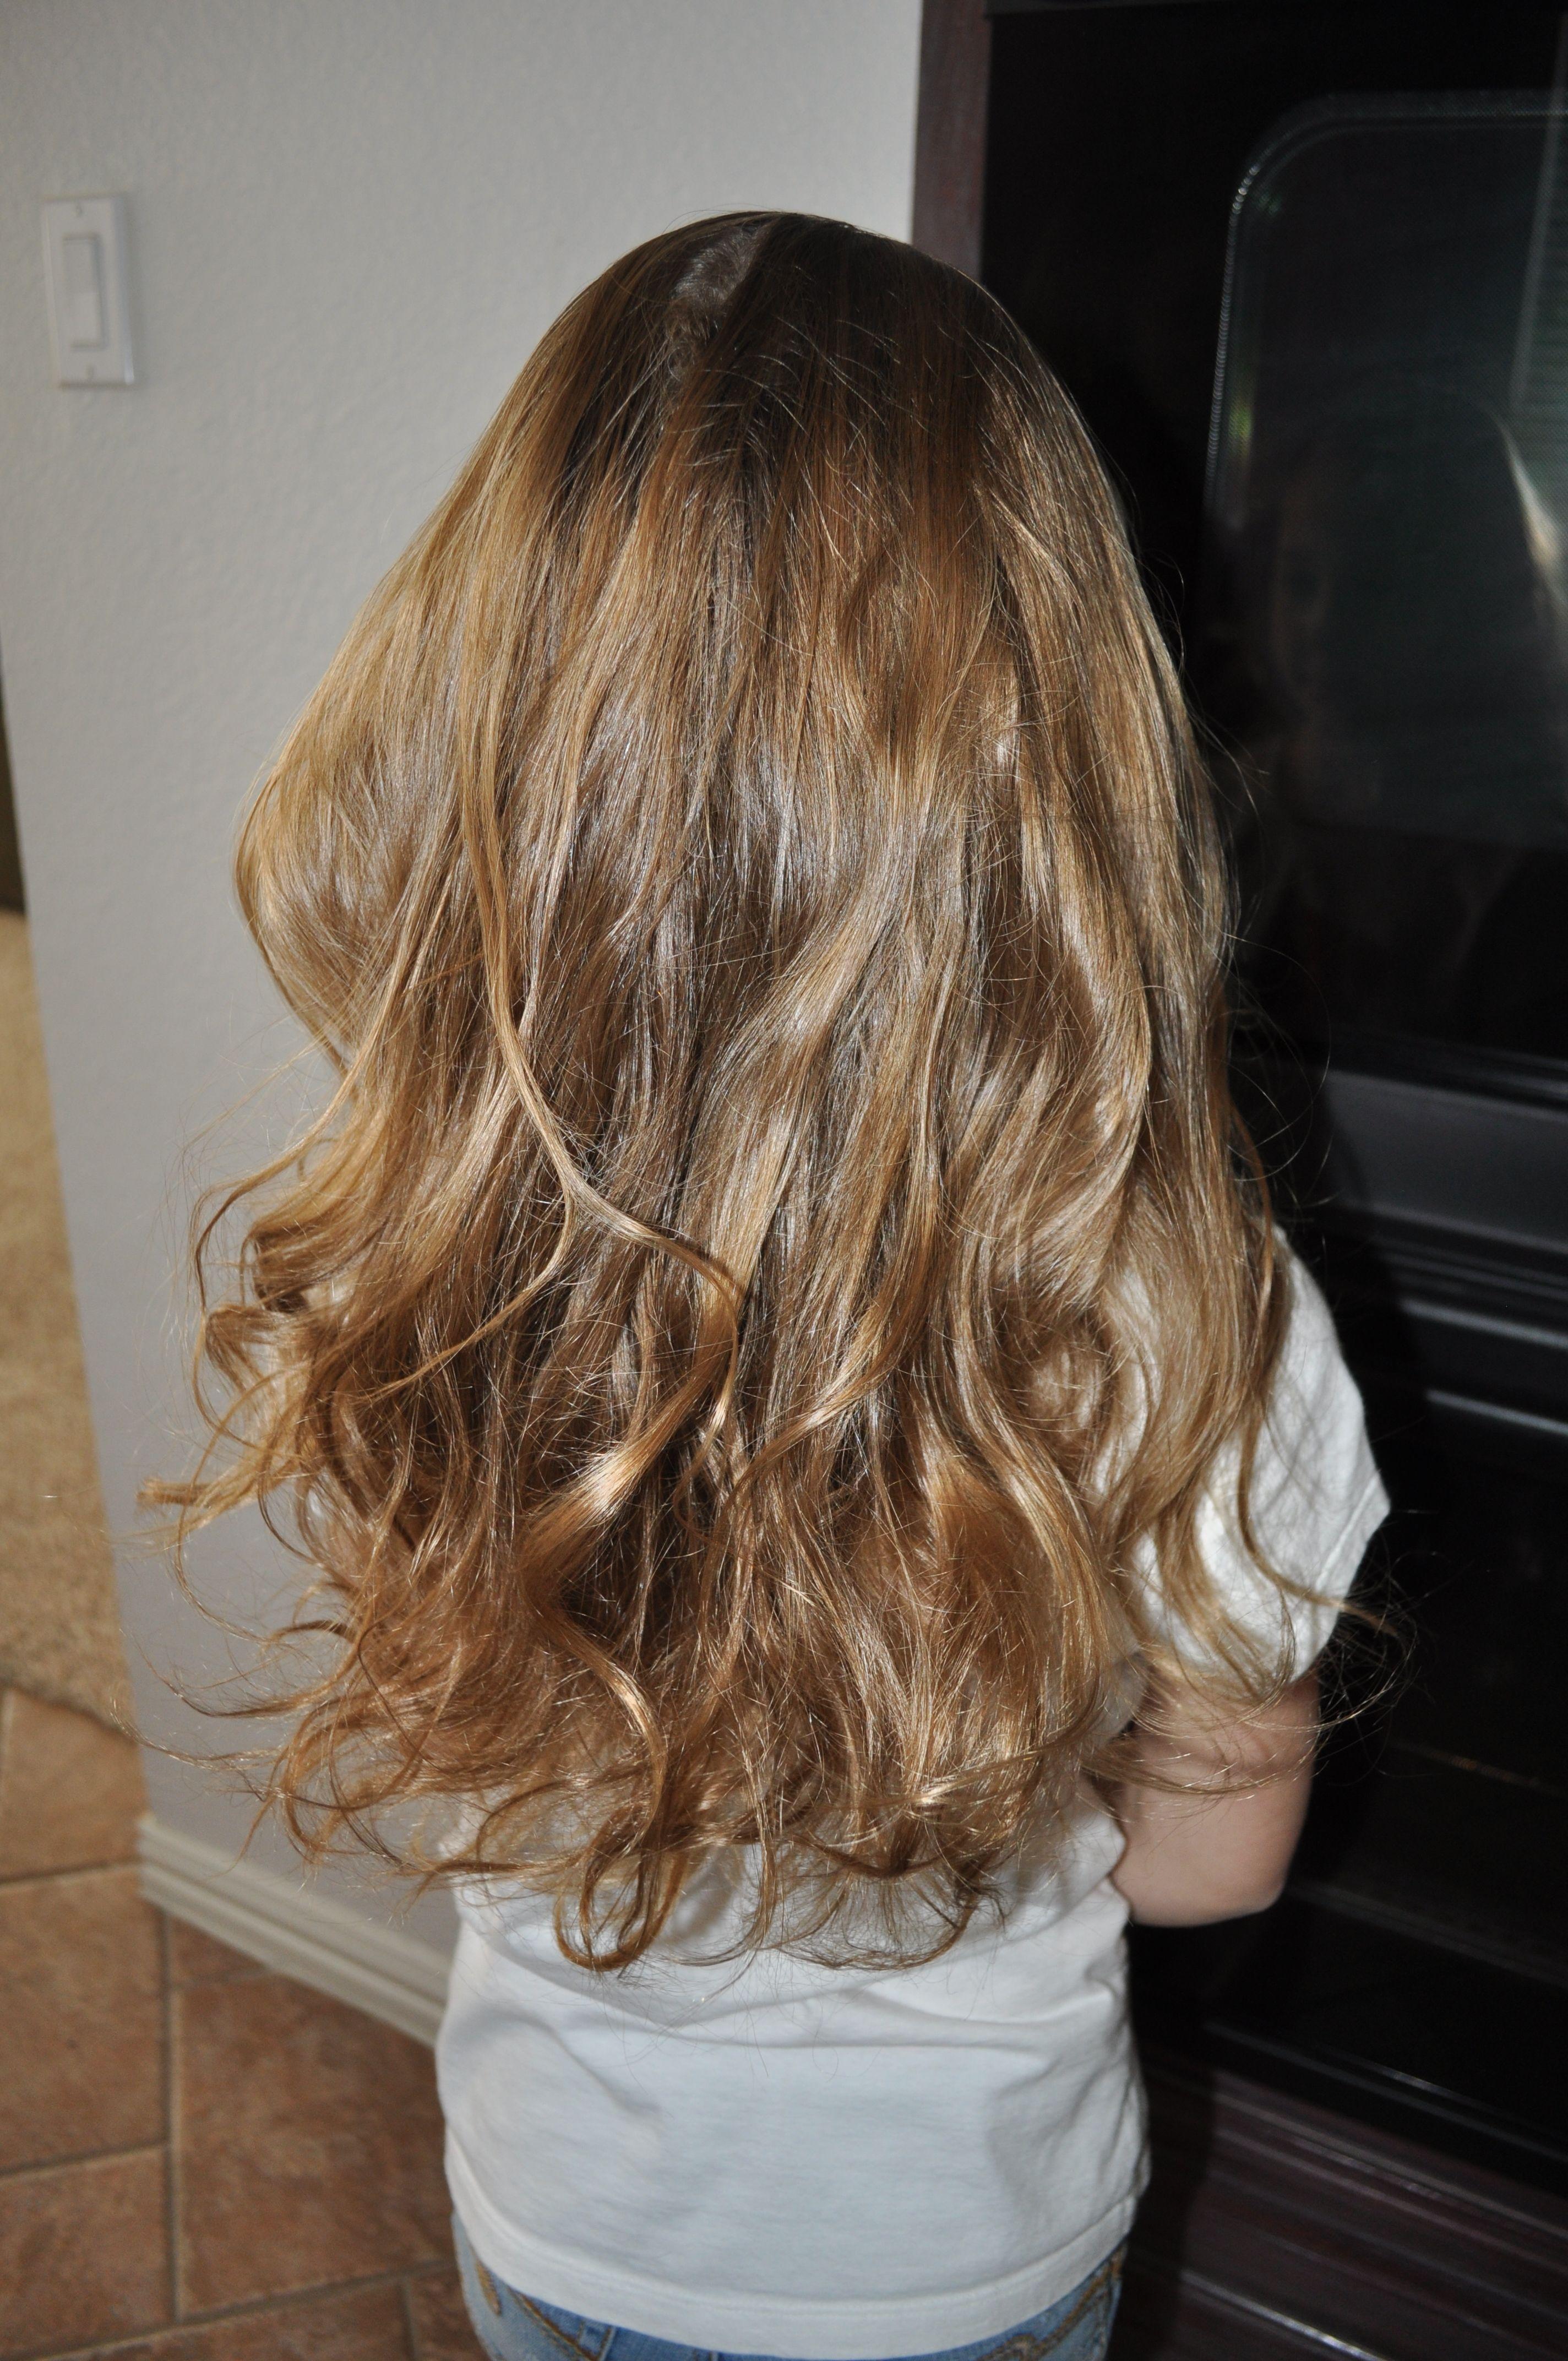 Jadeus hair after a sock bun overnight my style pinterest